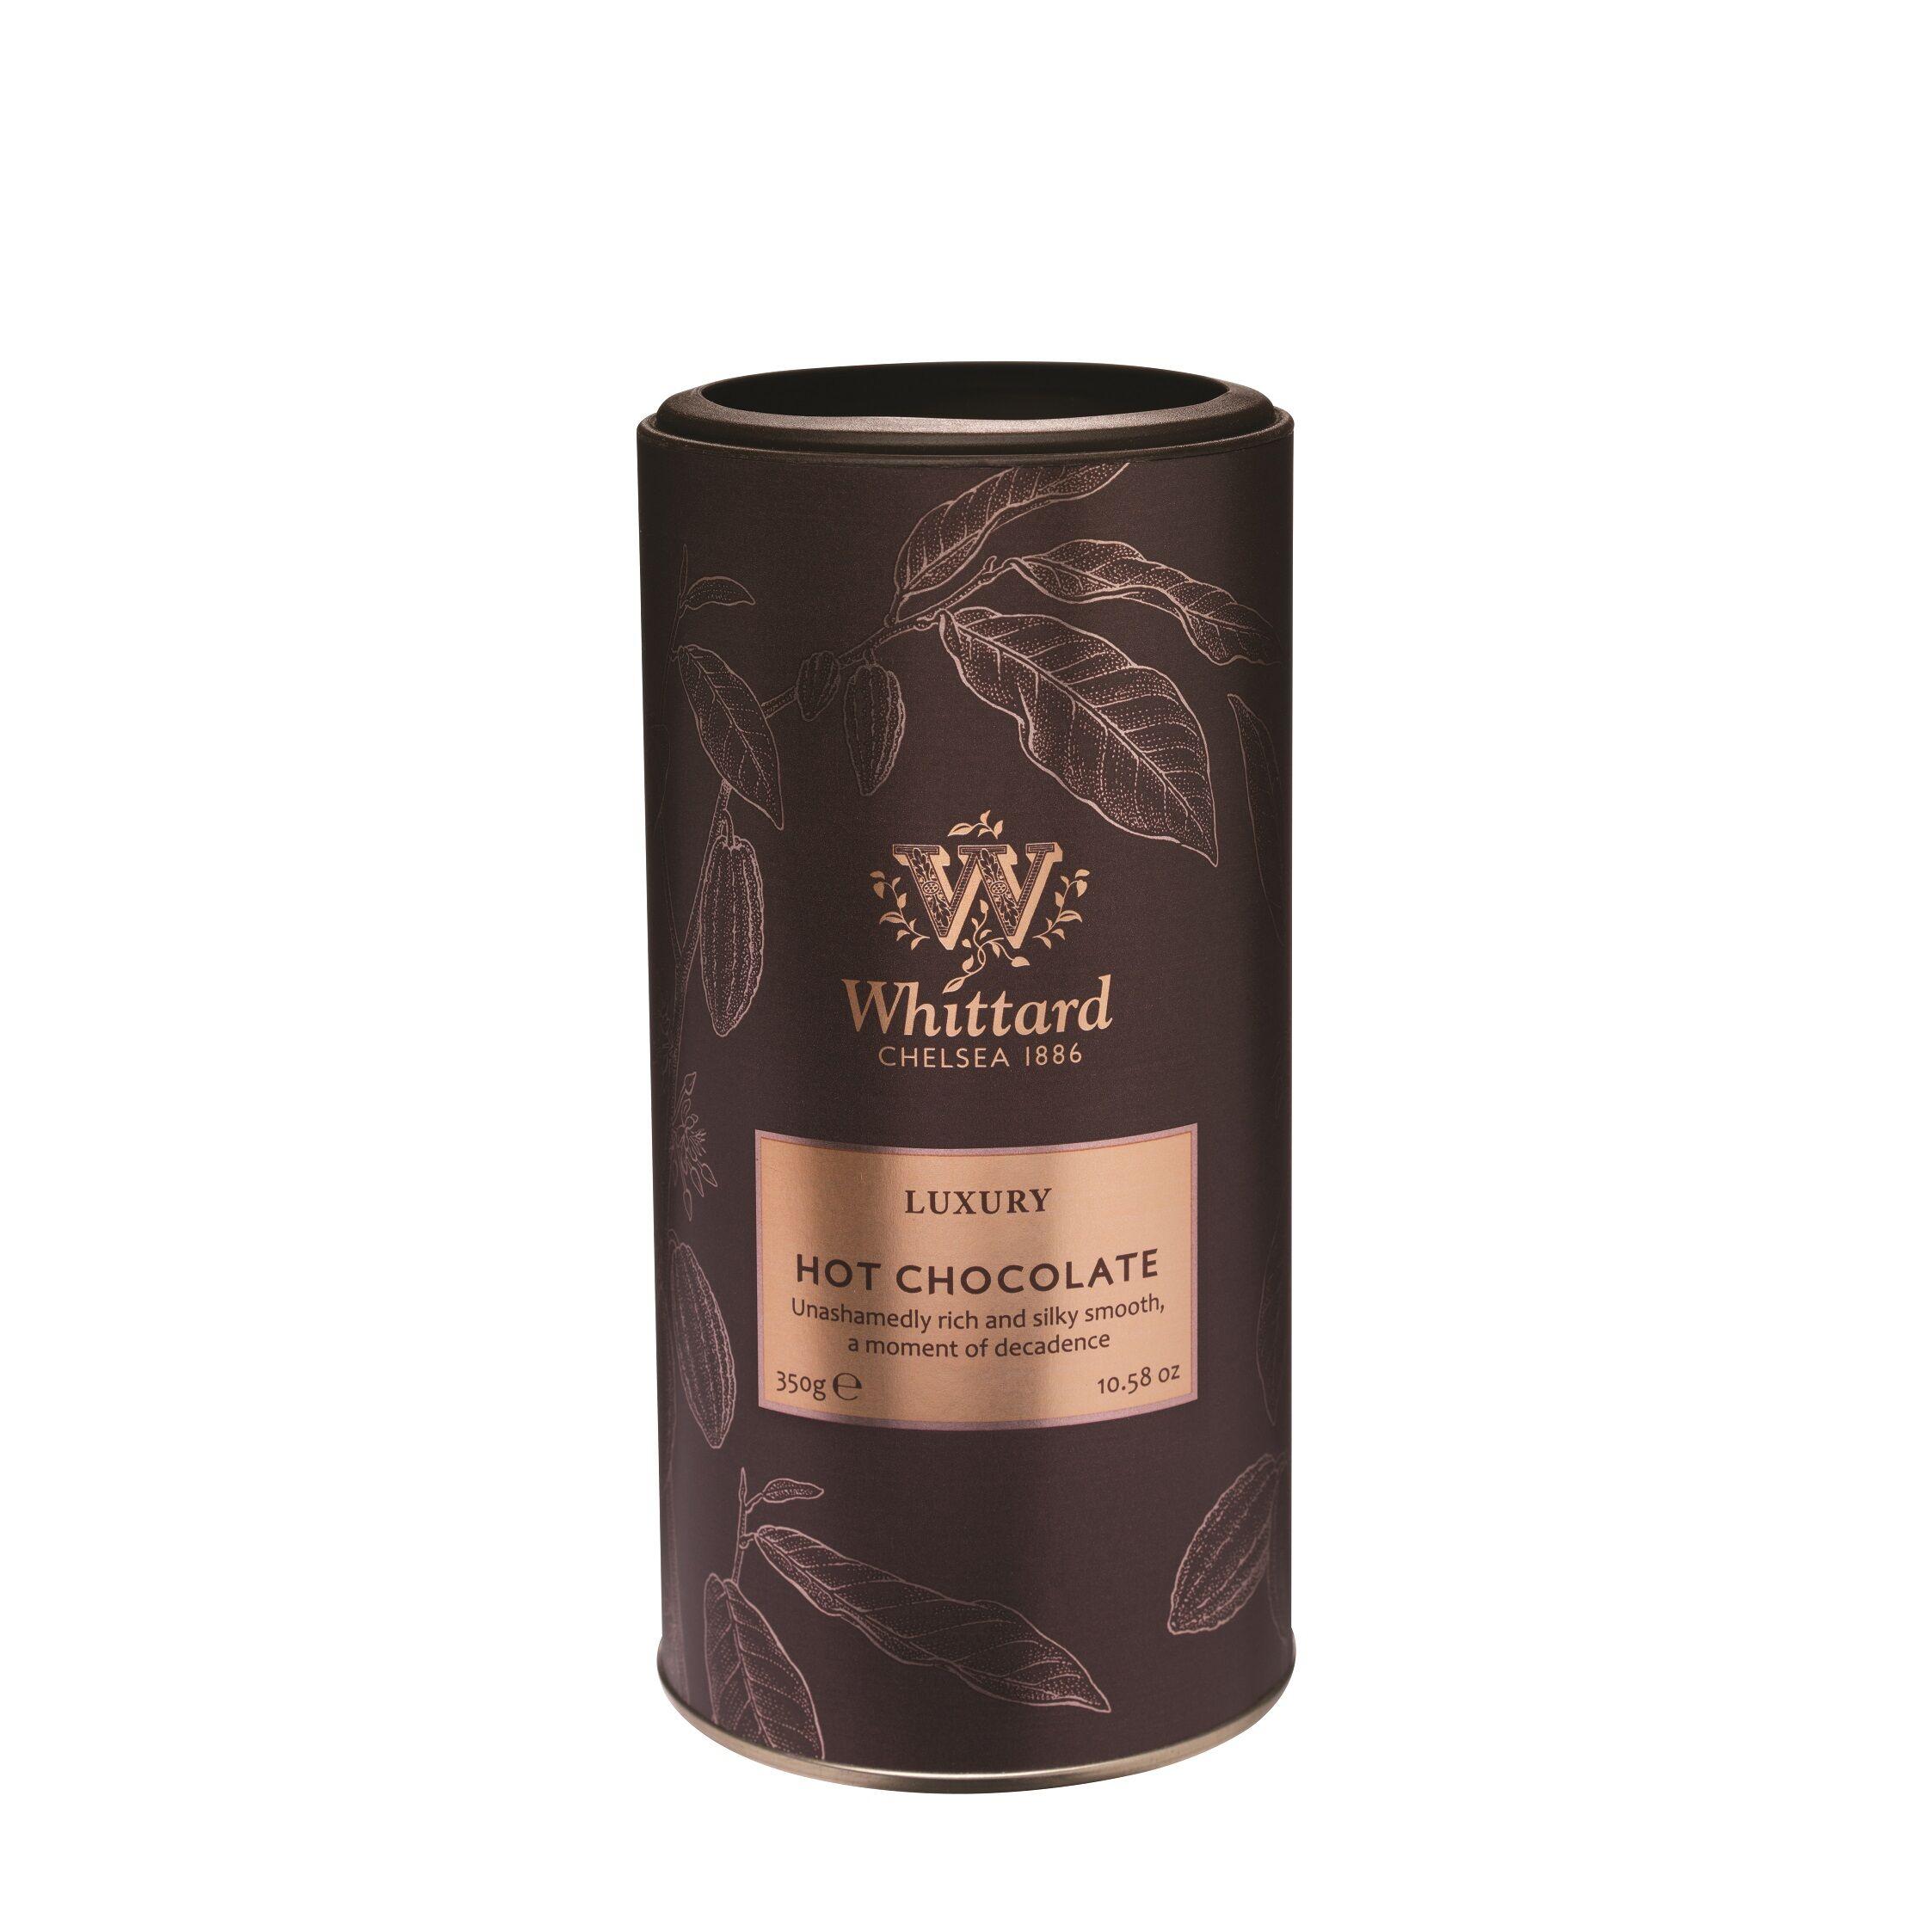 Standard produsent Hot Chocolate Luxury